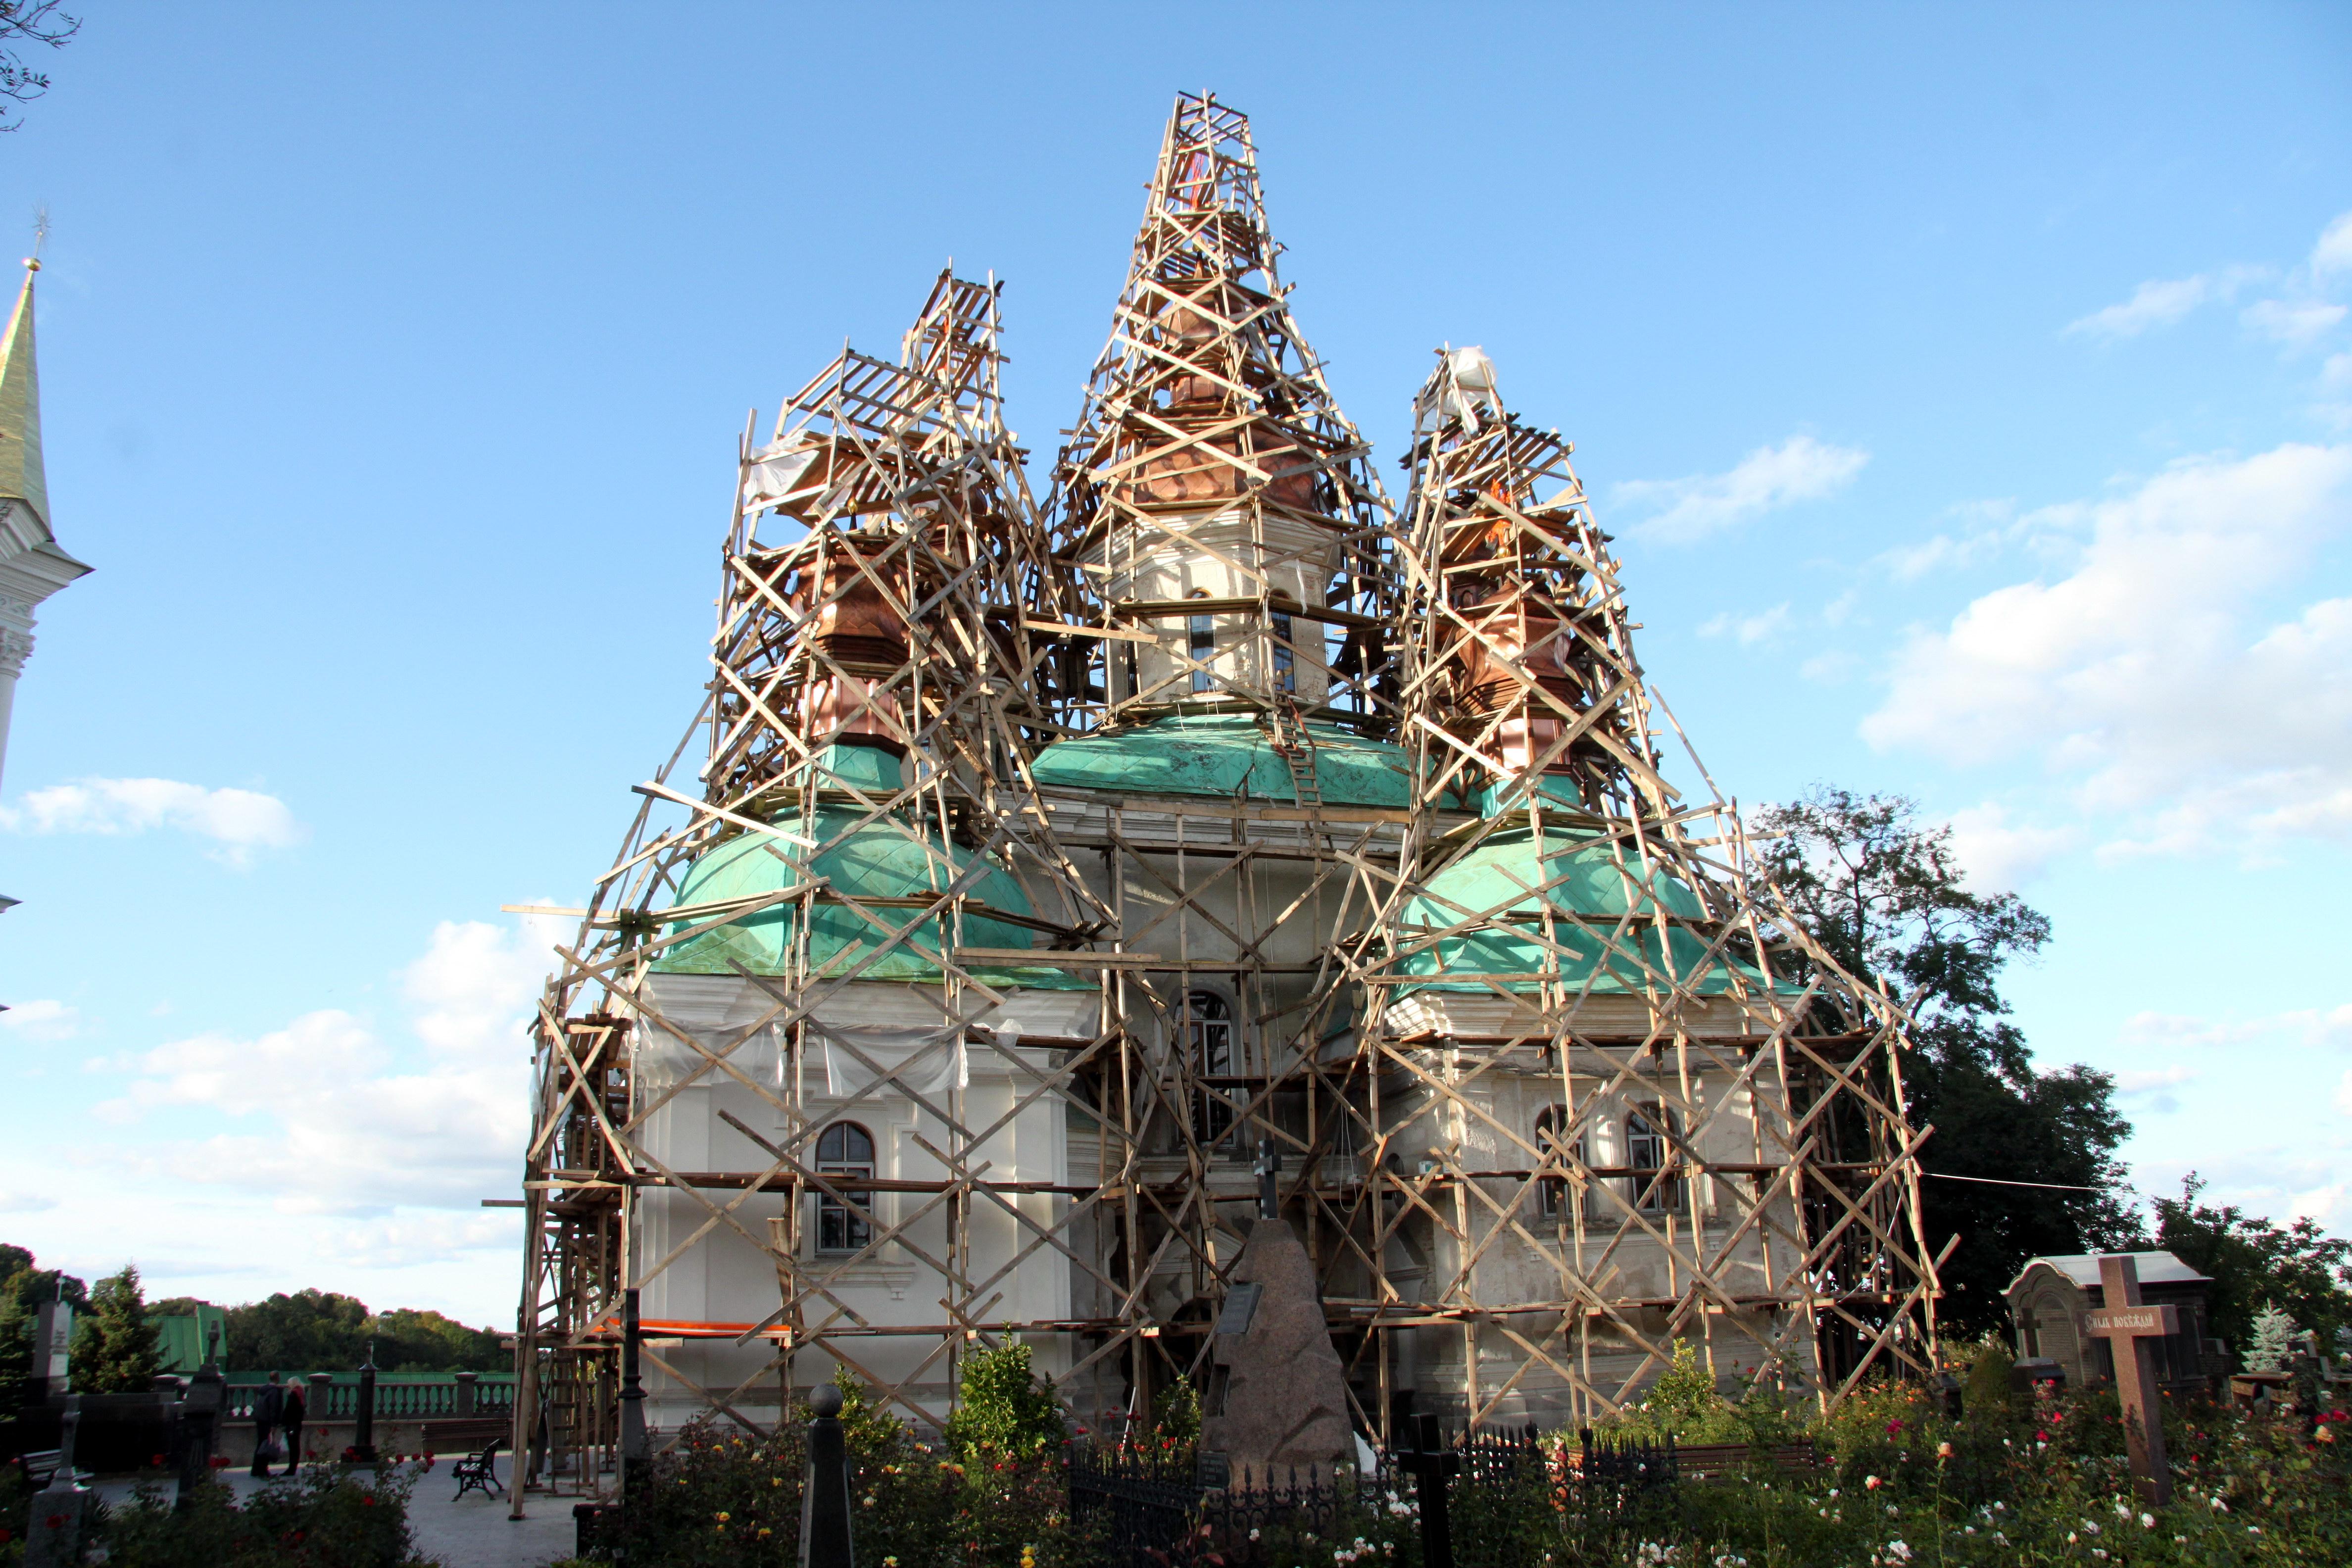 Nativity of the Theotokos Church, Kiev Pechersk Lavra. Under renovation. - Pechersk 613.jpg Українська: Церква Різдва Богородиці, Київ, Лаврська